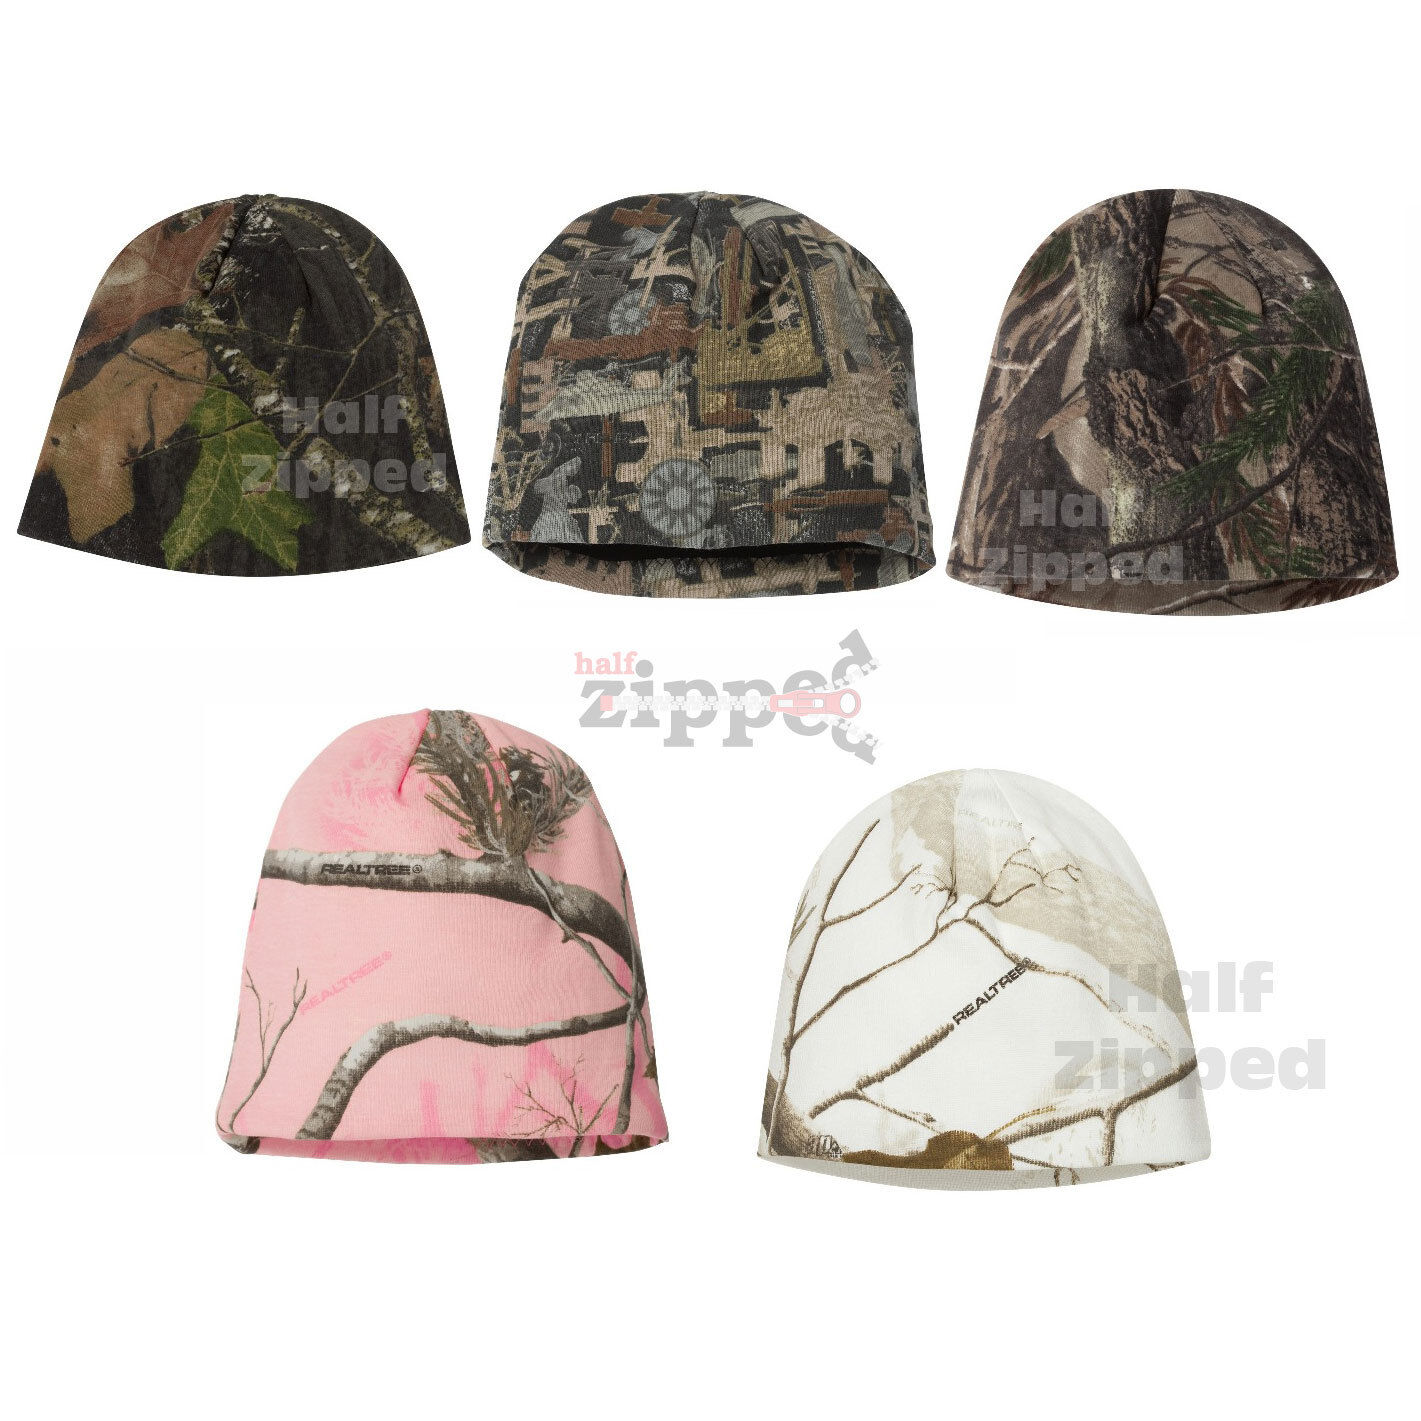 Kati Breakup 8/'/' Knit Cap Realtree All Purpose Pink Camo Beanie Hat LCB08 Ladies